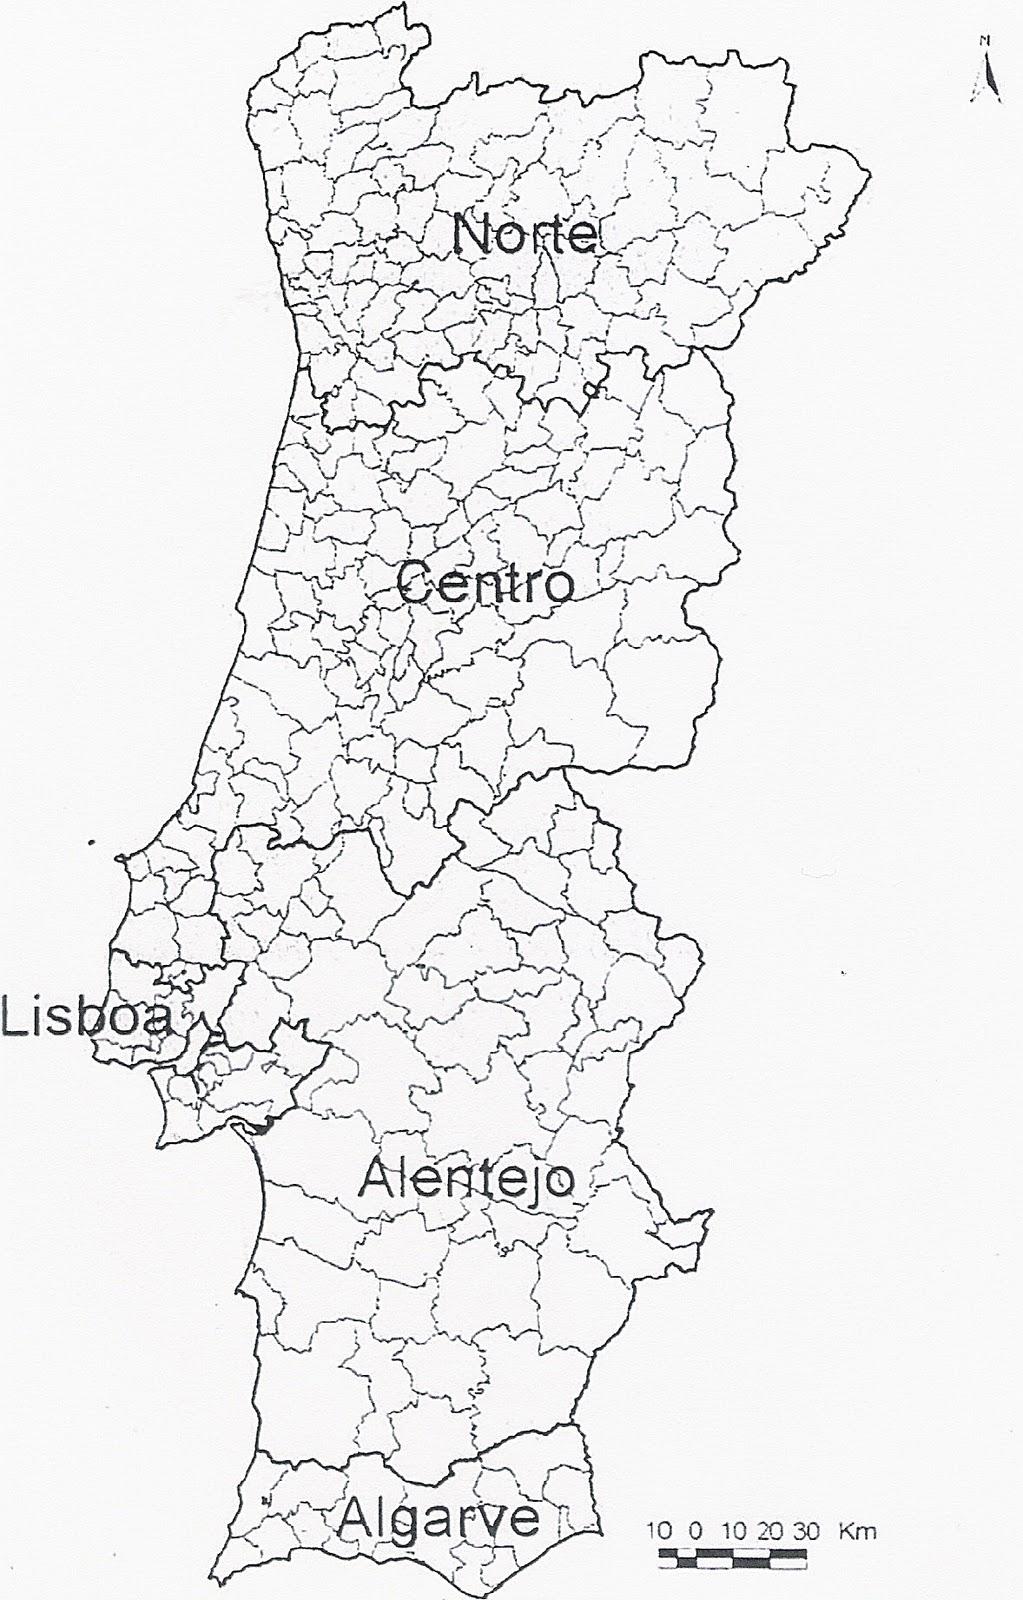 portugal concelhos mapa Mapa De Portugal Dividido Por Concelhos | thujamassages portugal concelhos mapa